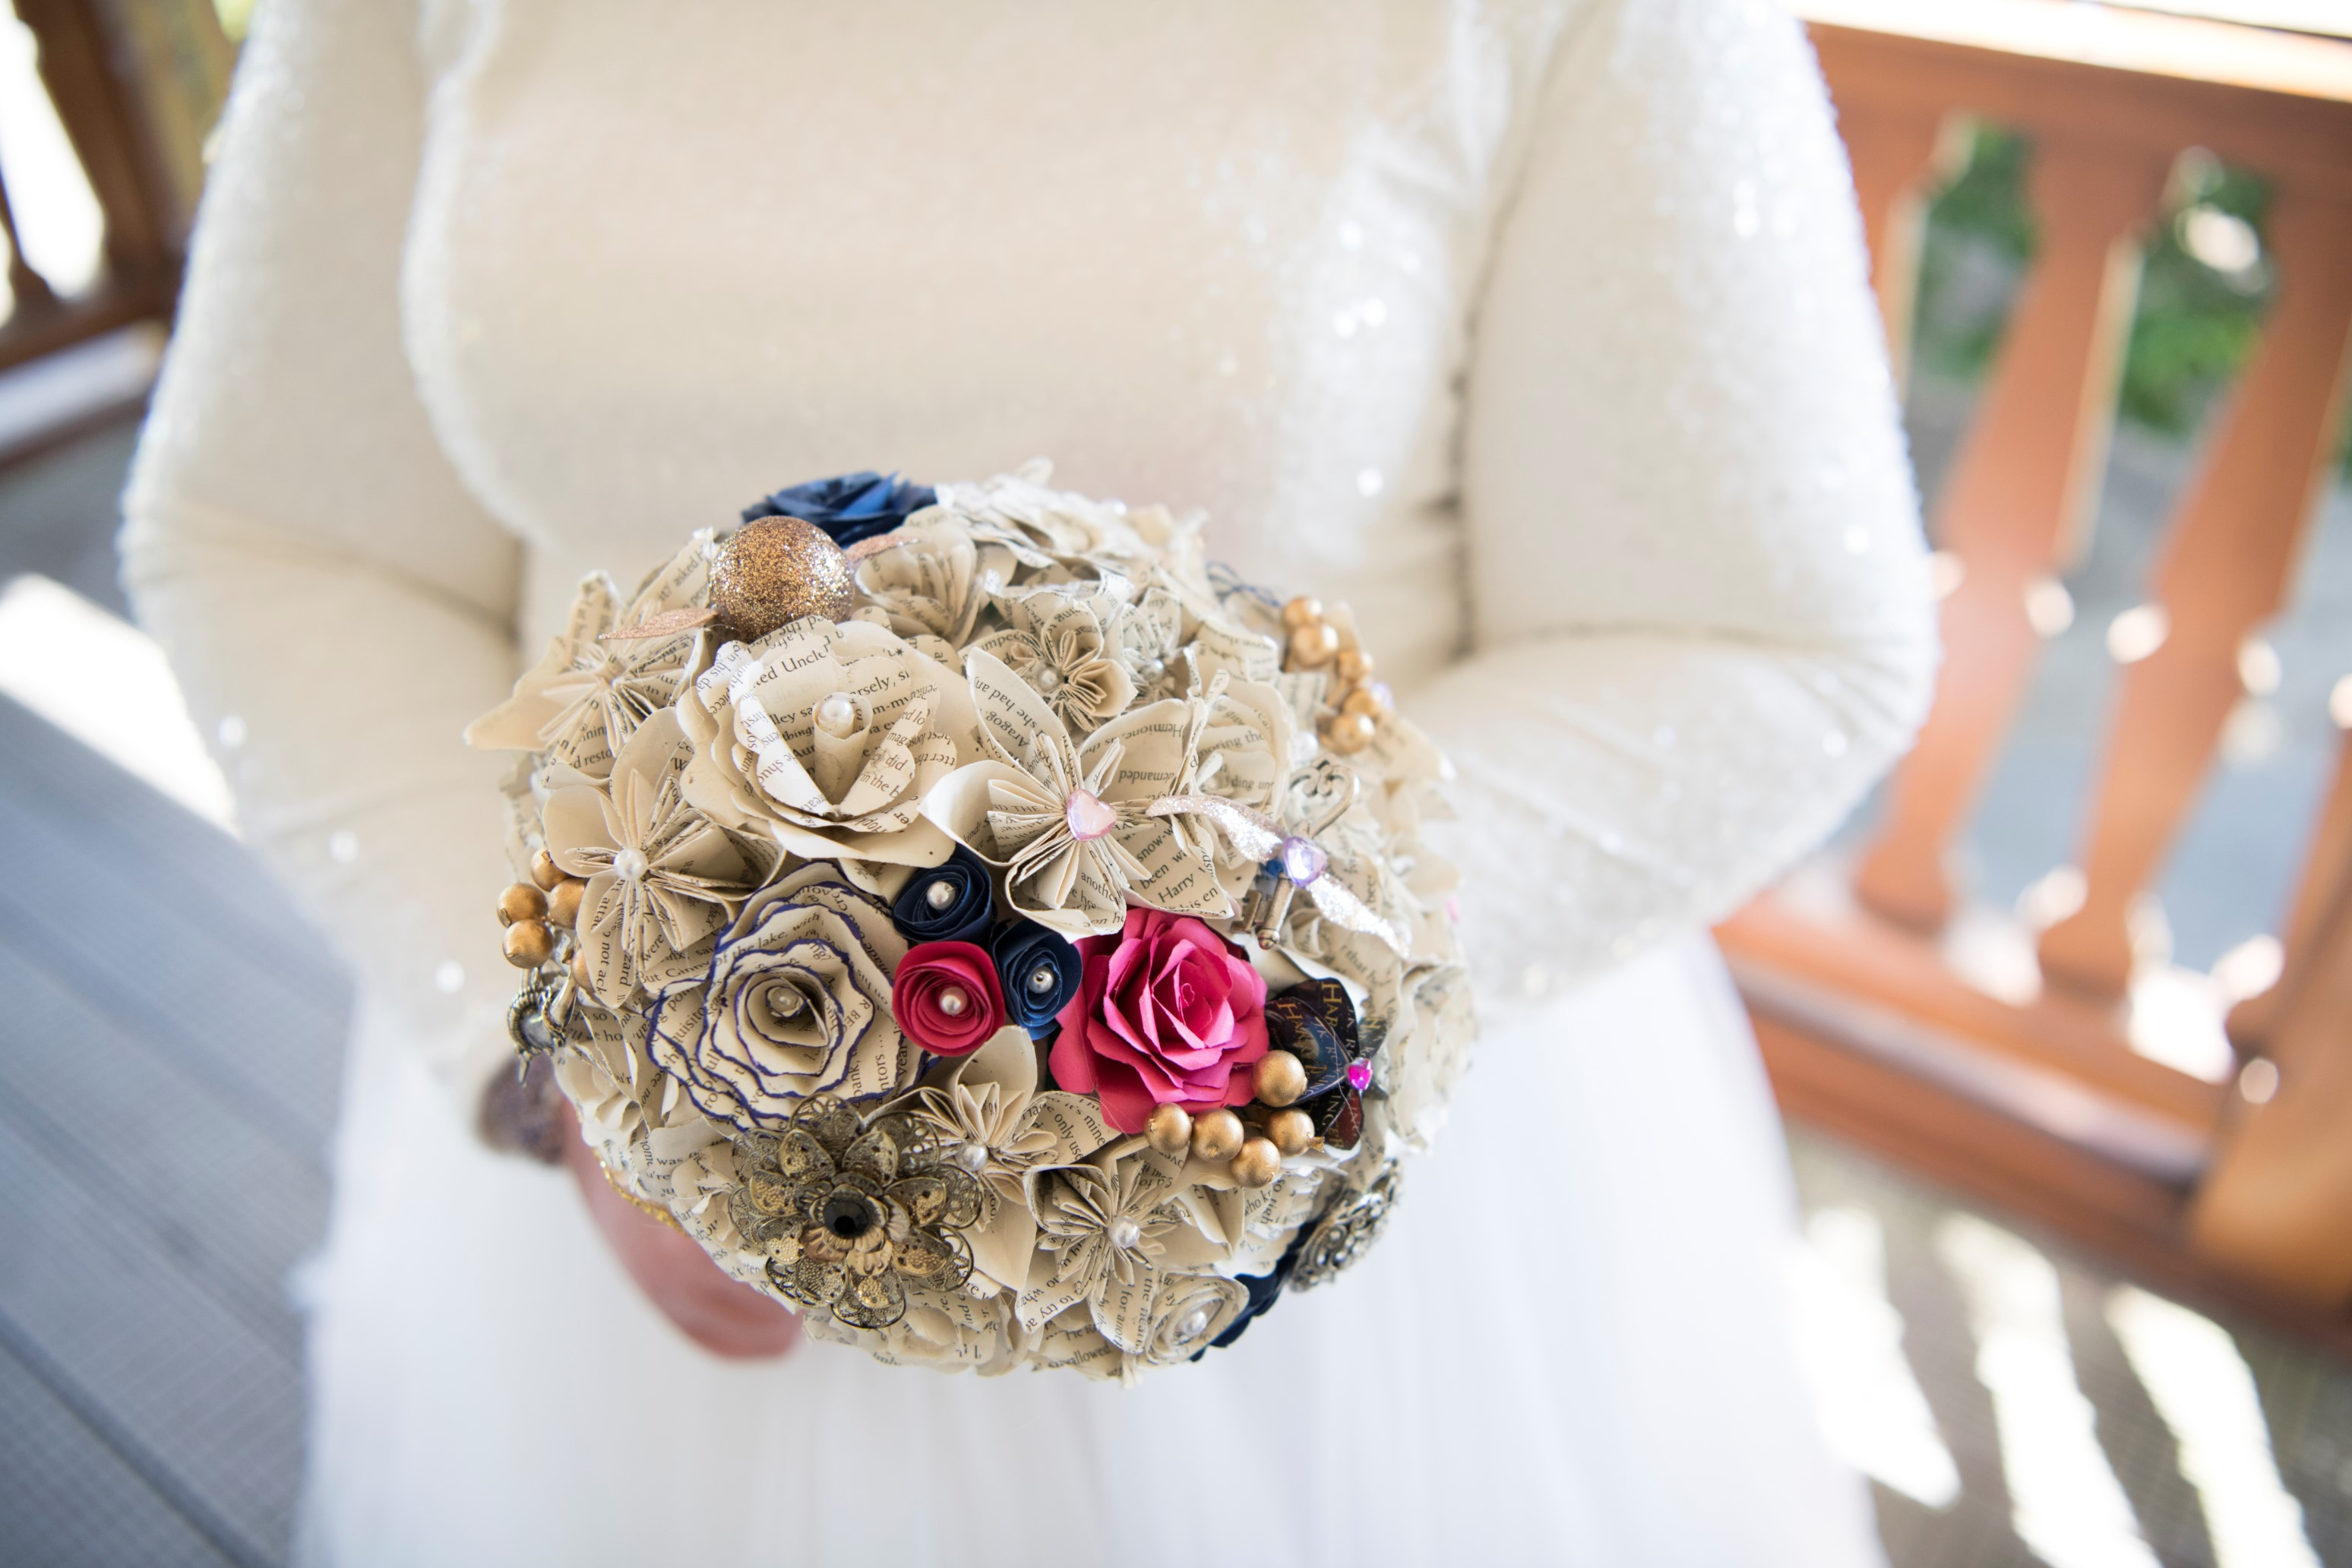 Zoo Wedding- Emma May Photography- Unconventional Wedding- Unique Wedding Inspiration- Alternative Wedding Bouquet